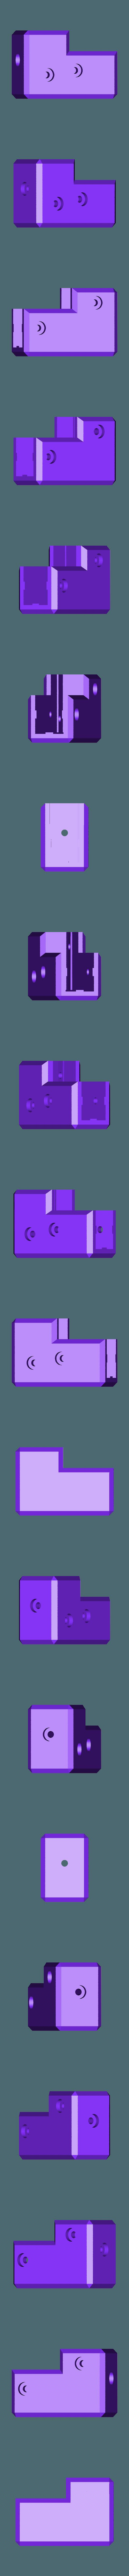 2020_CornerBlock2_V2.stl Download free STL file 2020 Profile Aluminum 3D Printable Erector Set • 3D printer model, adamjvr